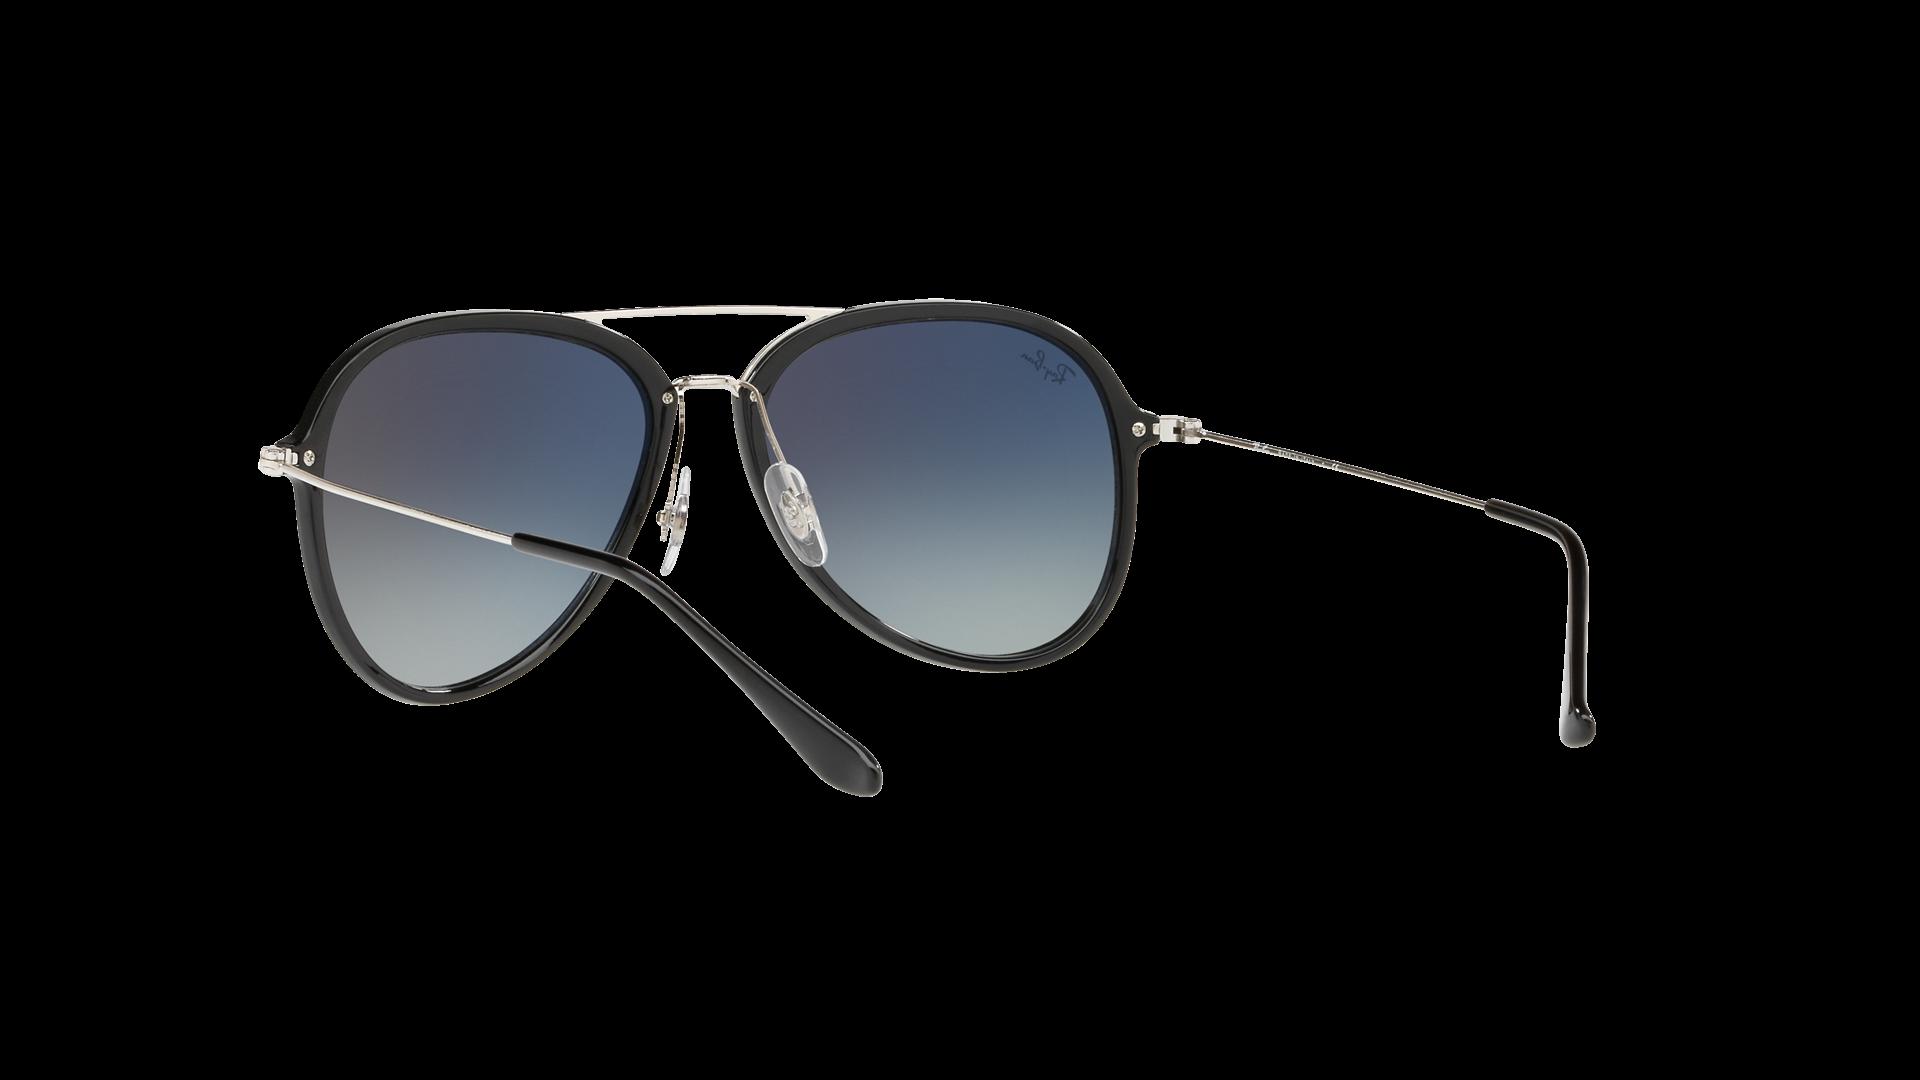 1a692cc7f23 Sunglasses Ray-Ban RB4298 601 71 57-17 Black Large Gradient